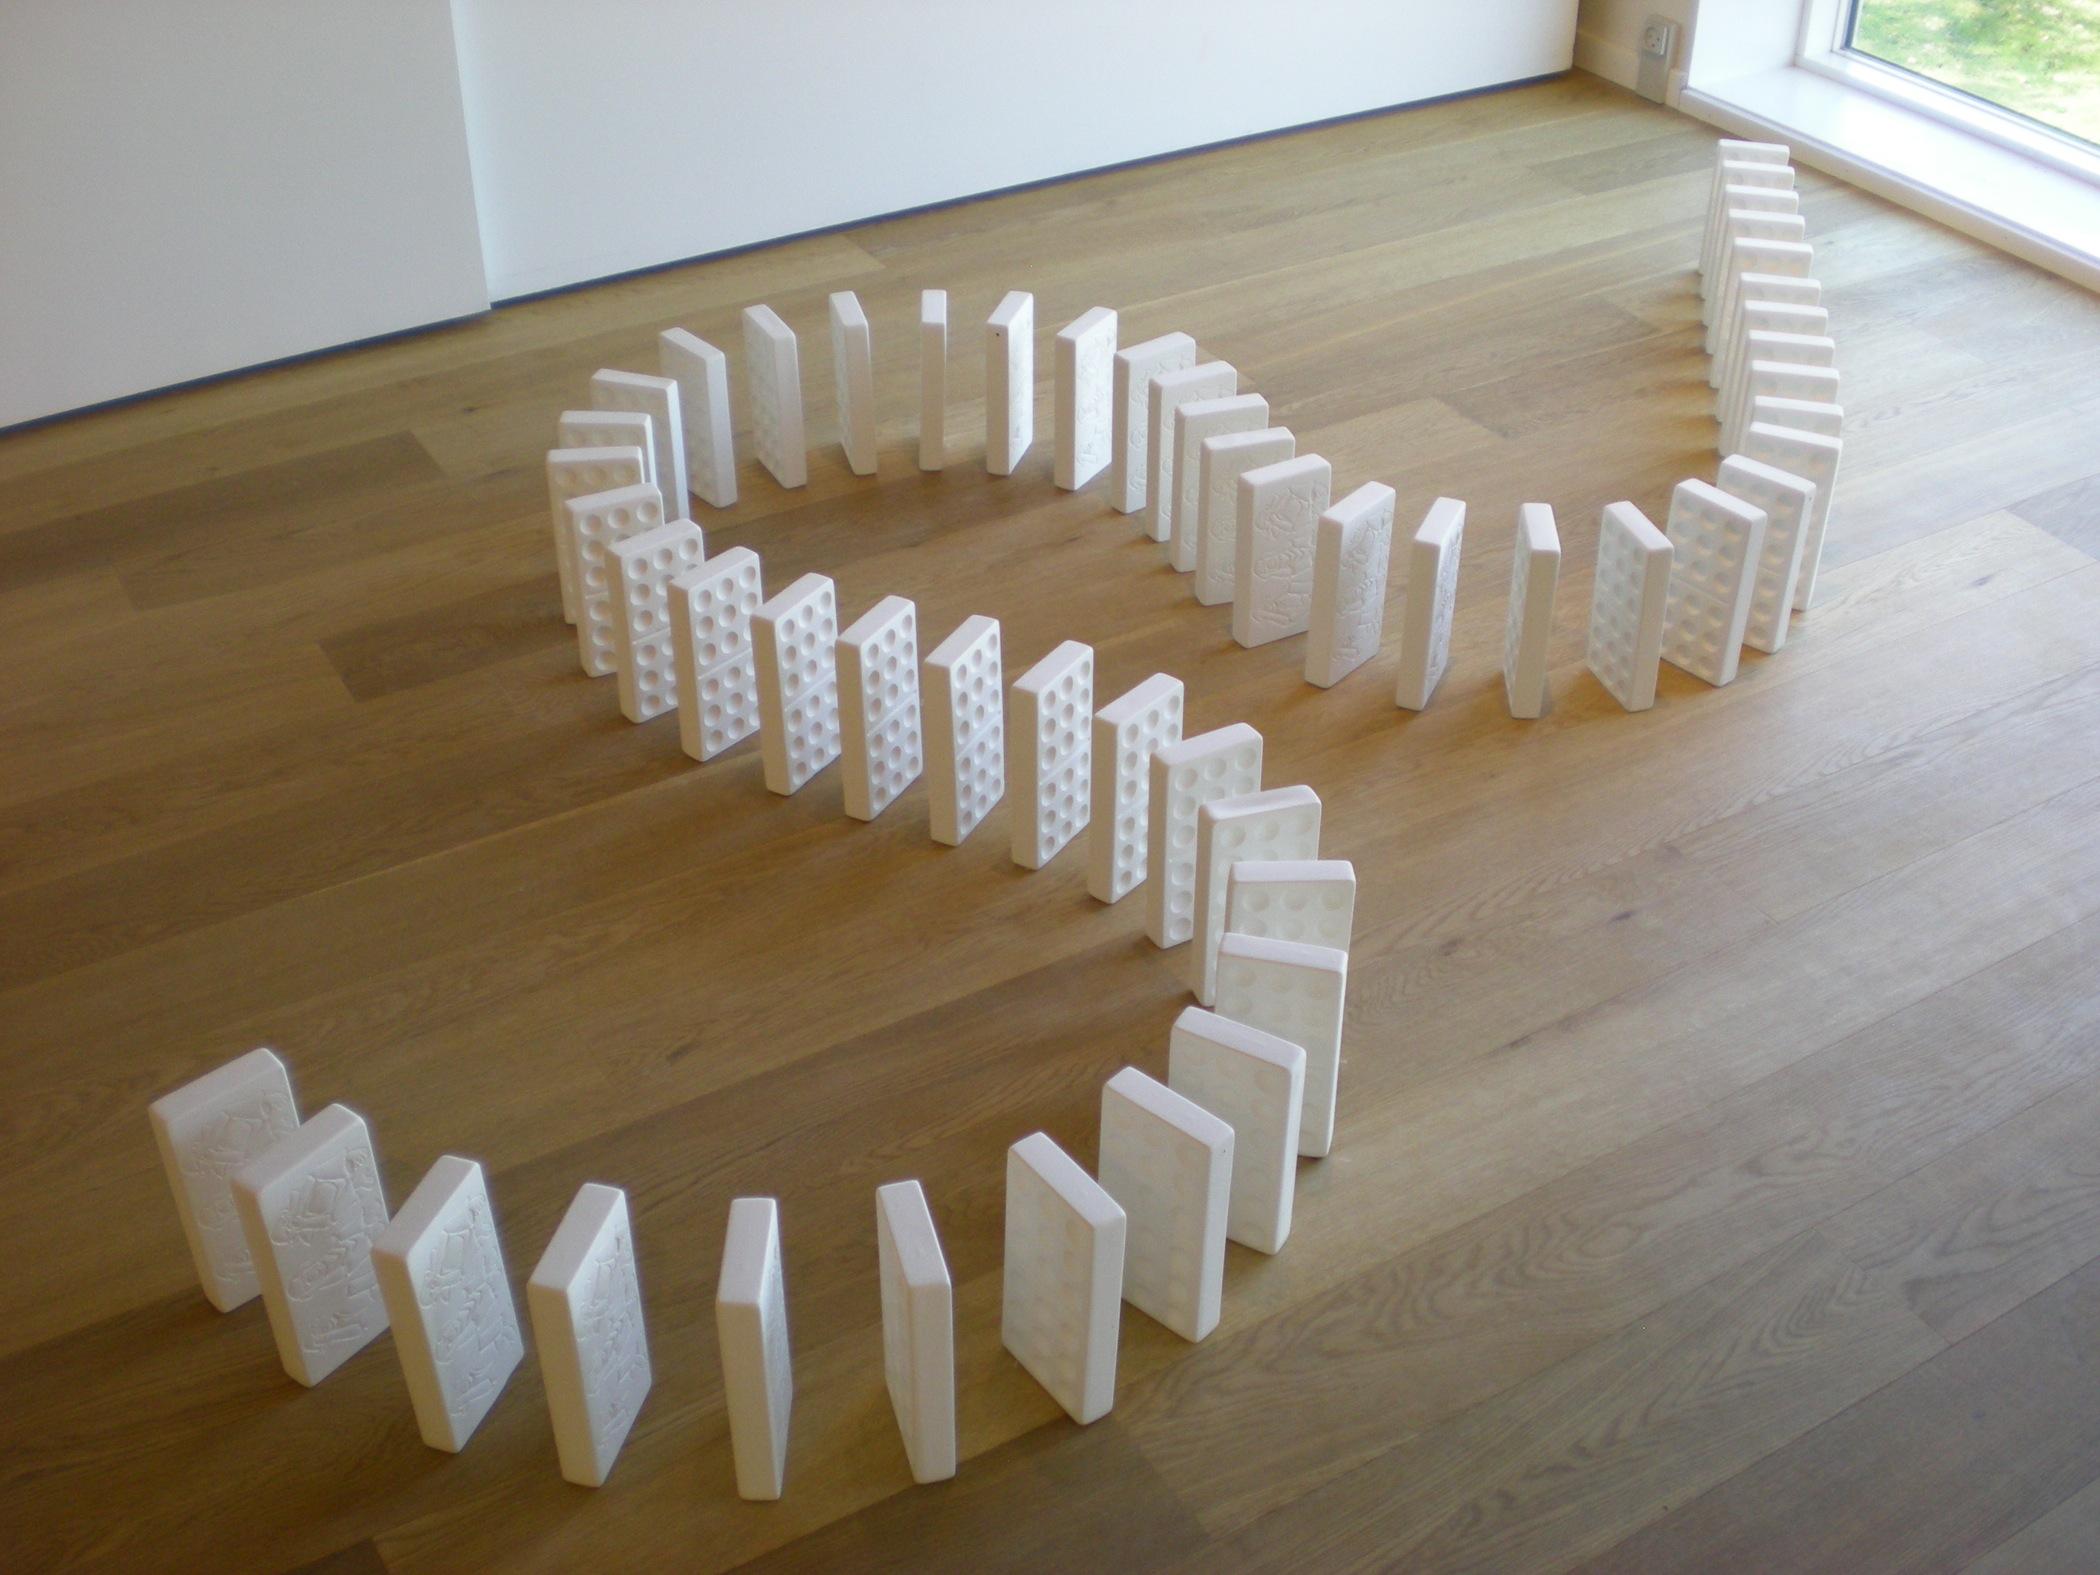 Mizaru, Kikazaru, Iwazaru, unfired porcelain, dimensions variable, 2010